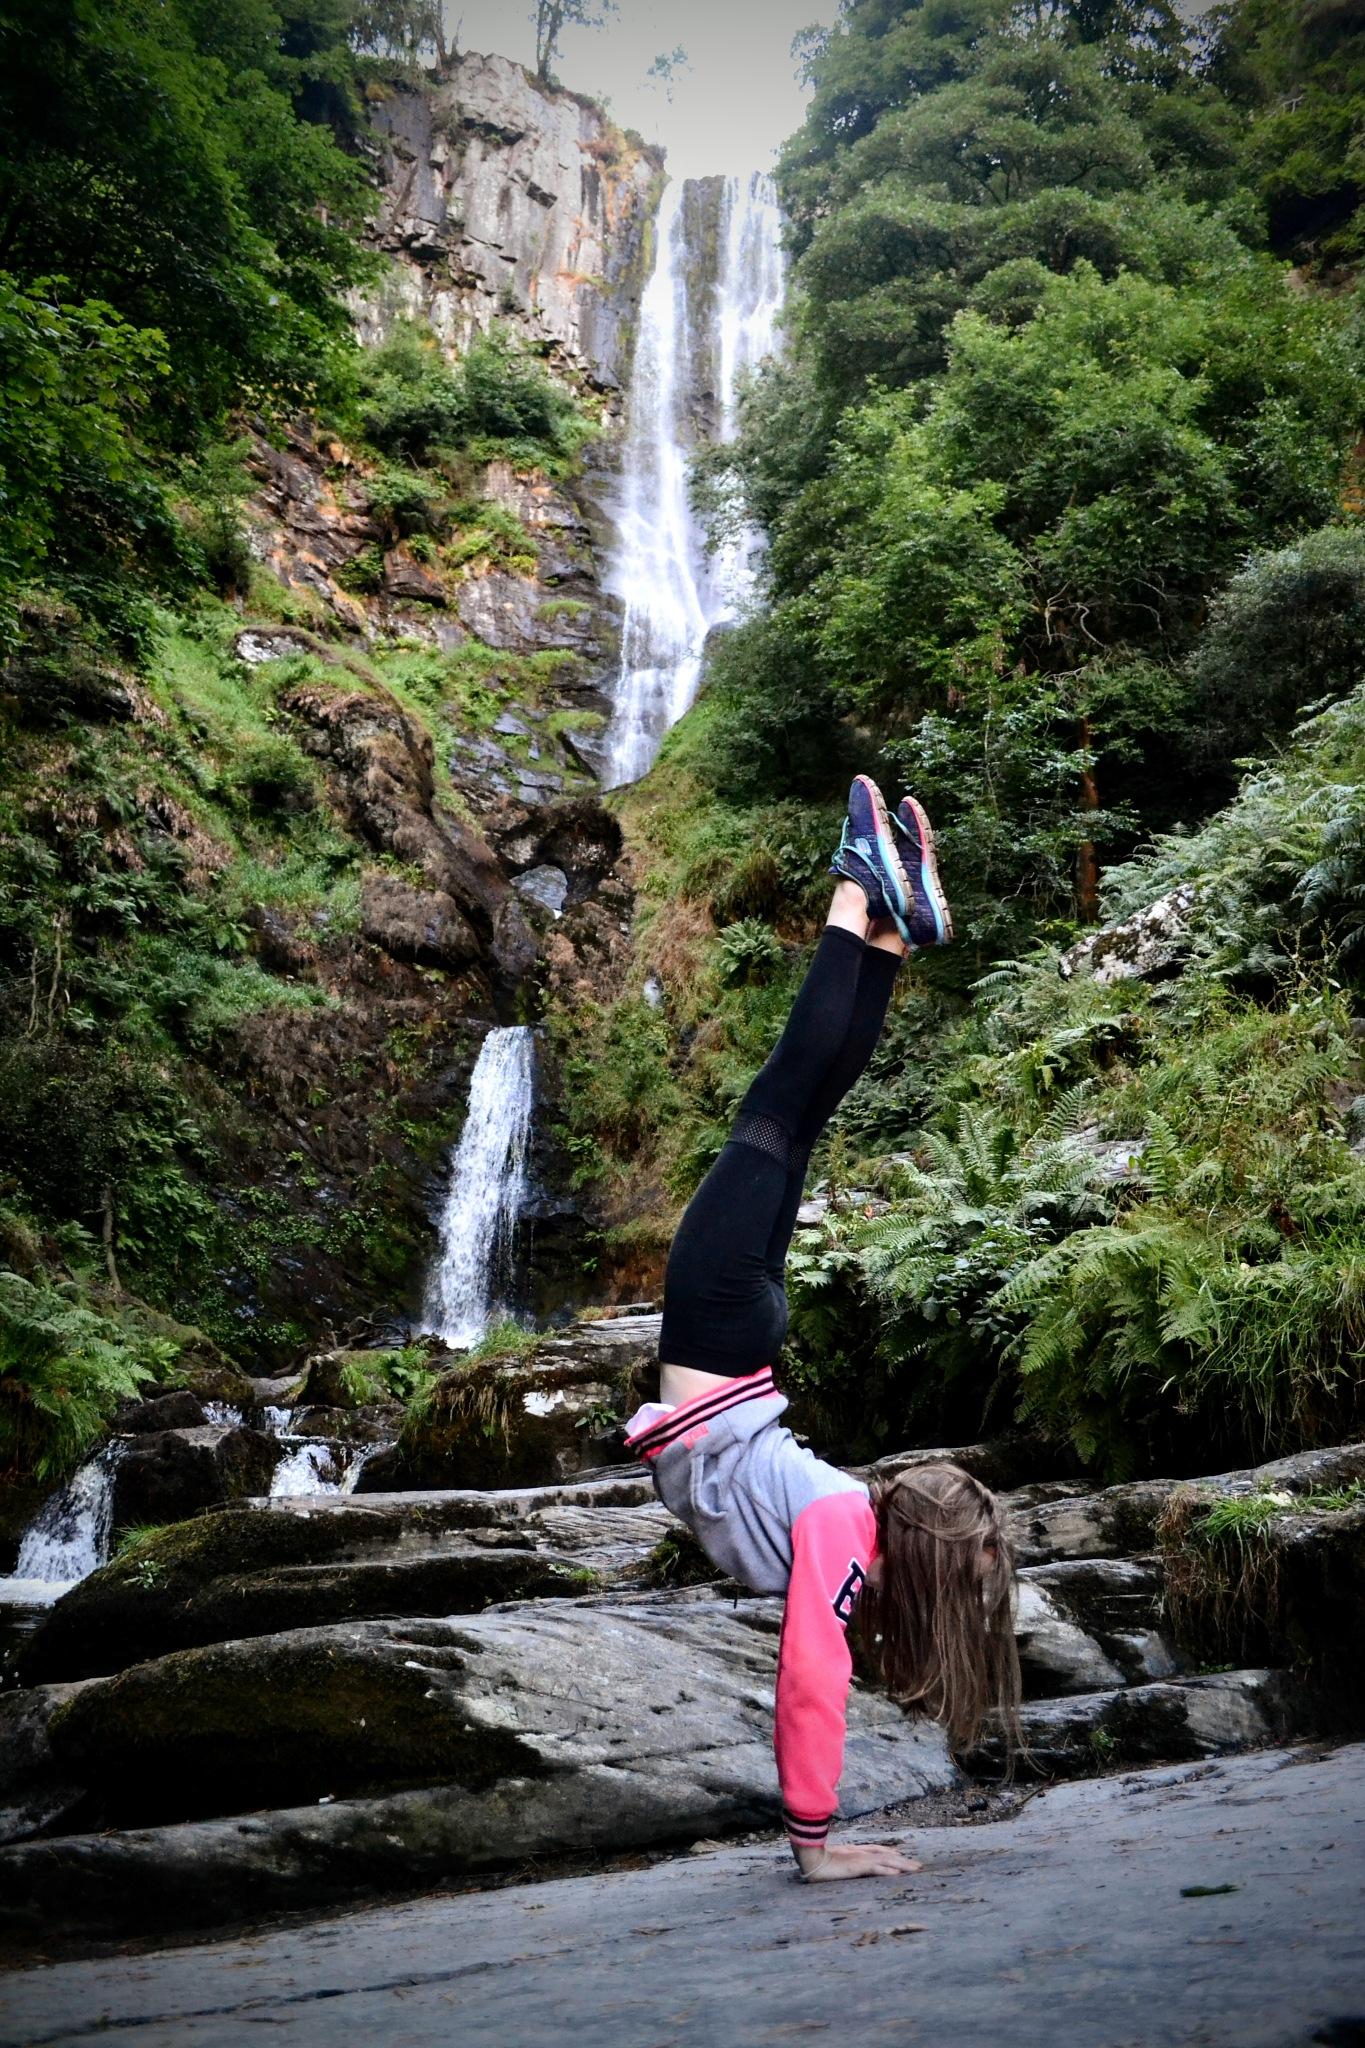 Gymnastics and Landmarks  by Jordan Hayward